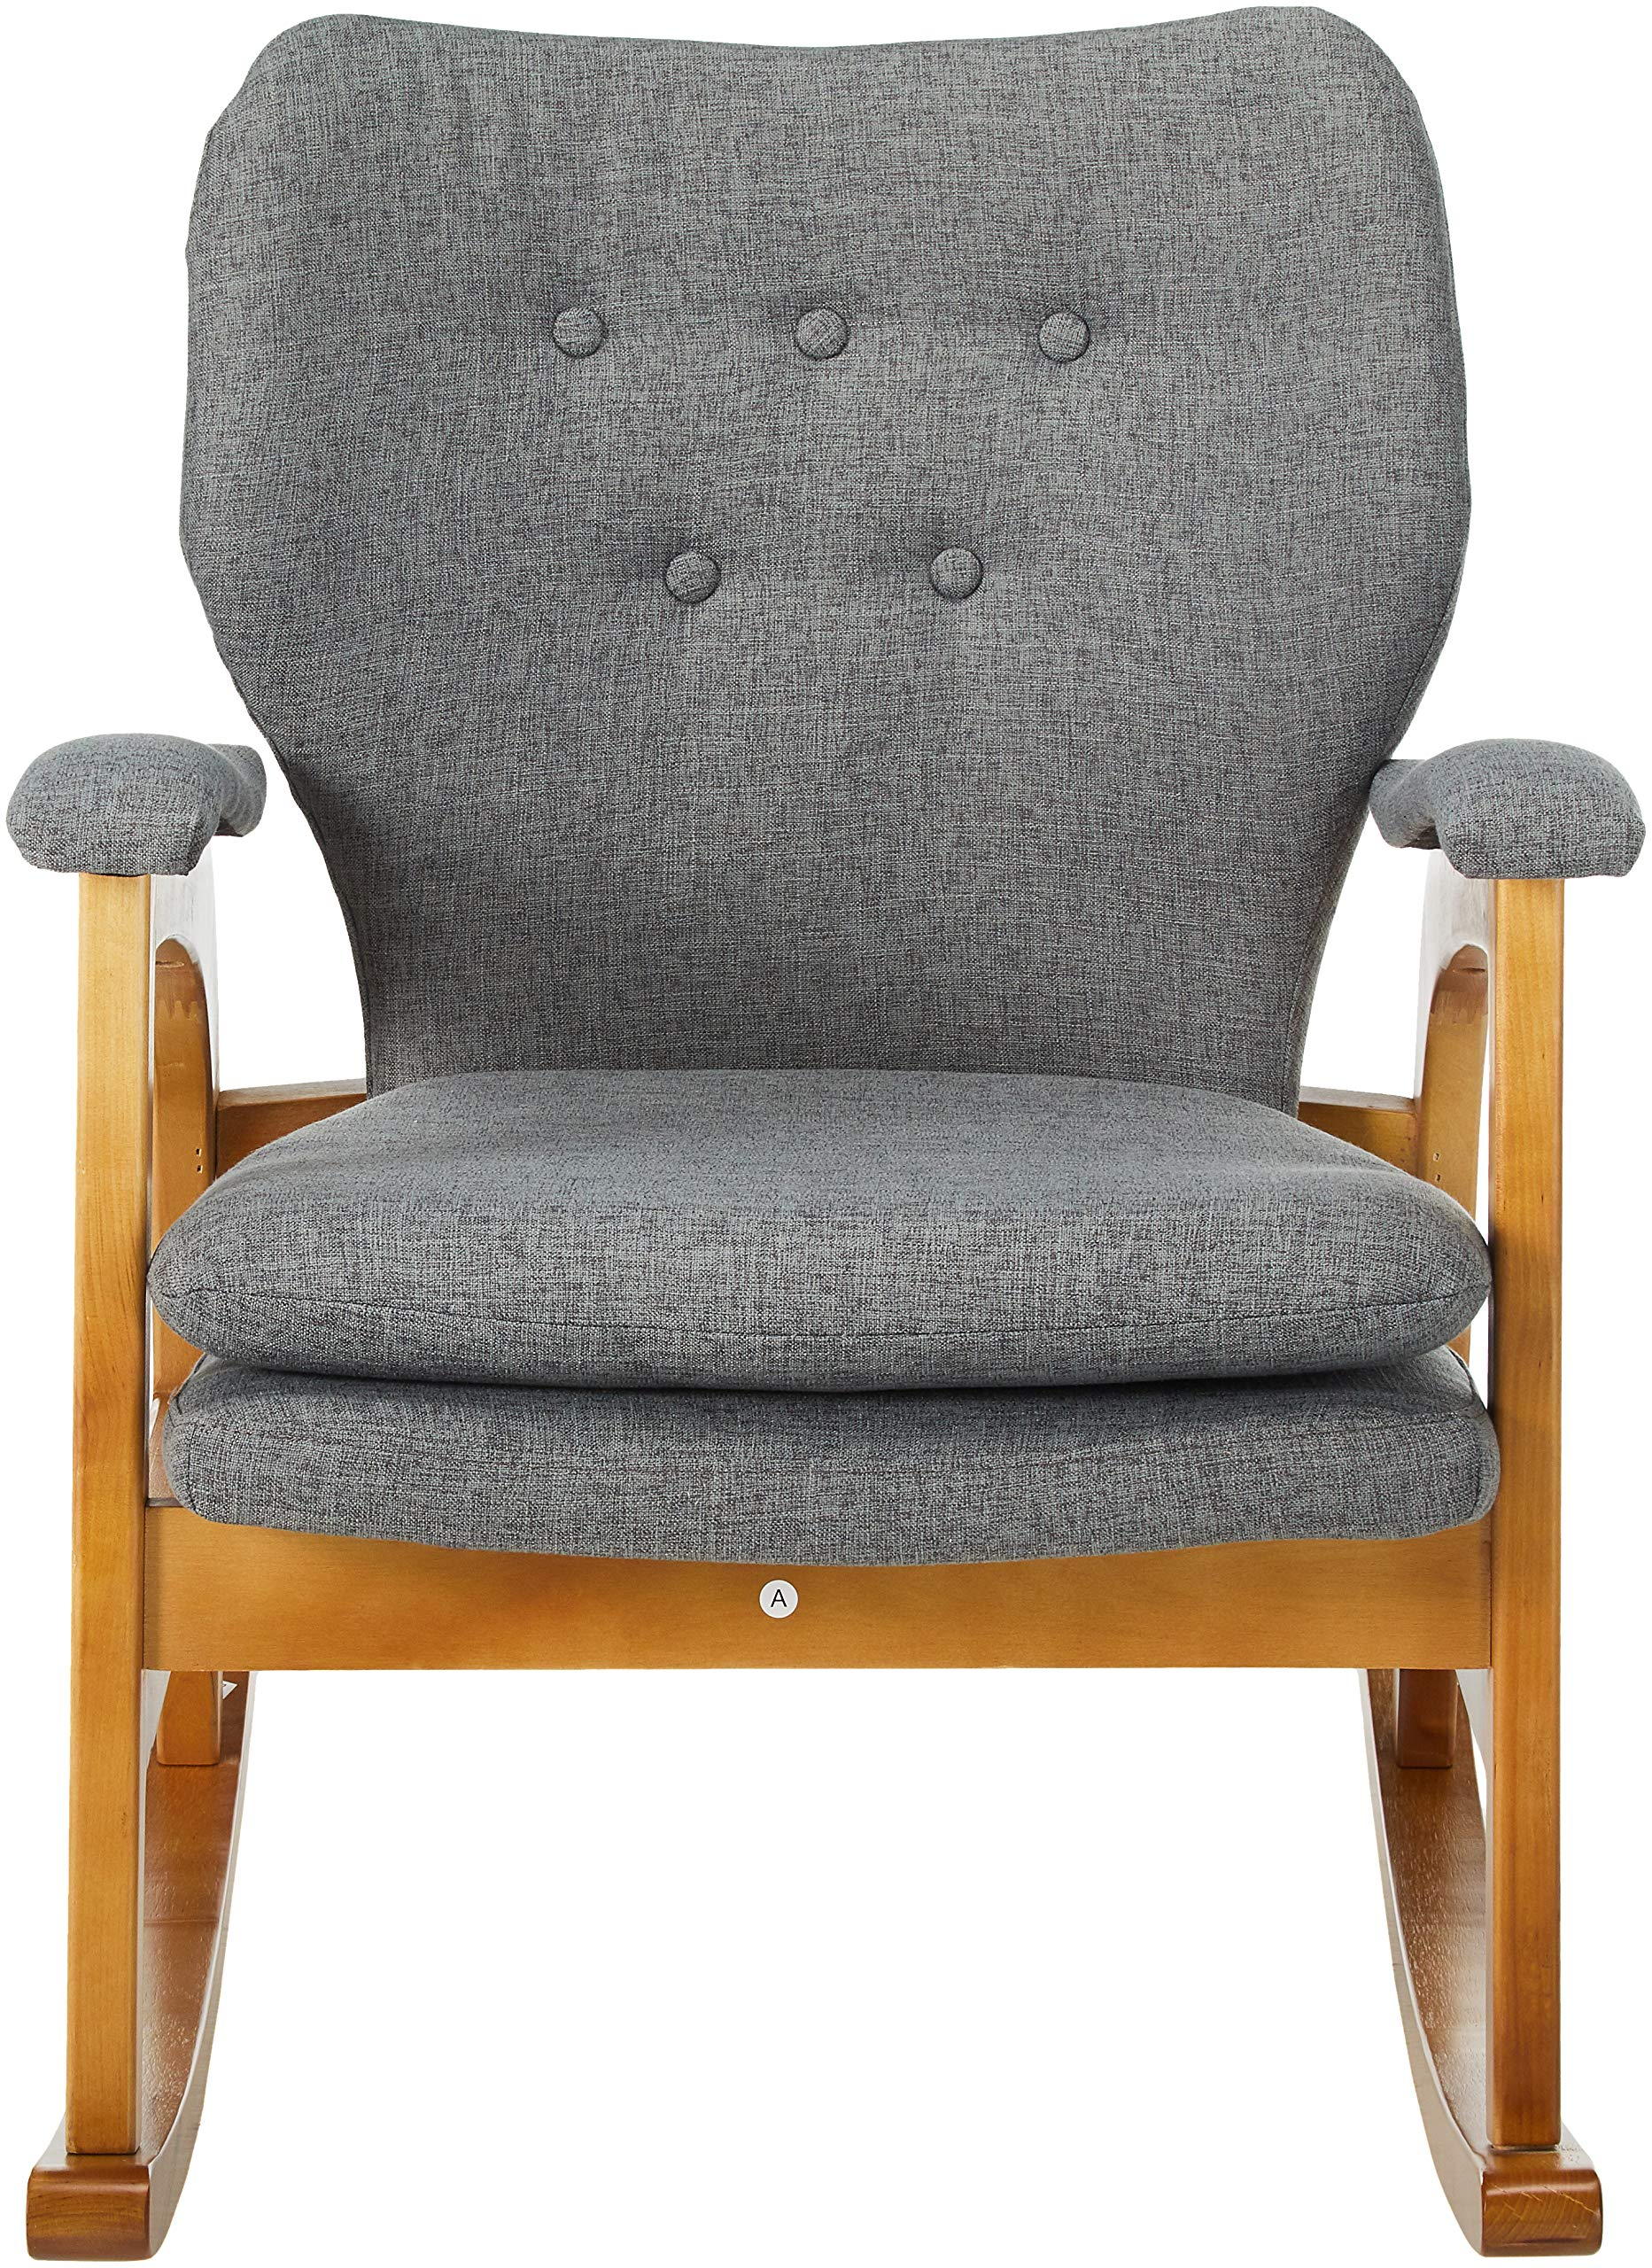 Christopher Knight Home Braant Mid-Century Fabric Rocker, Grey / Light Walnut